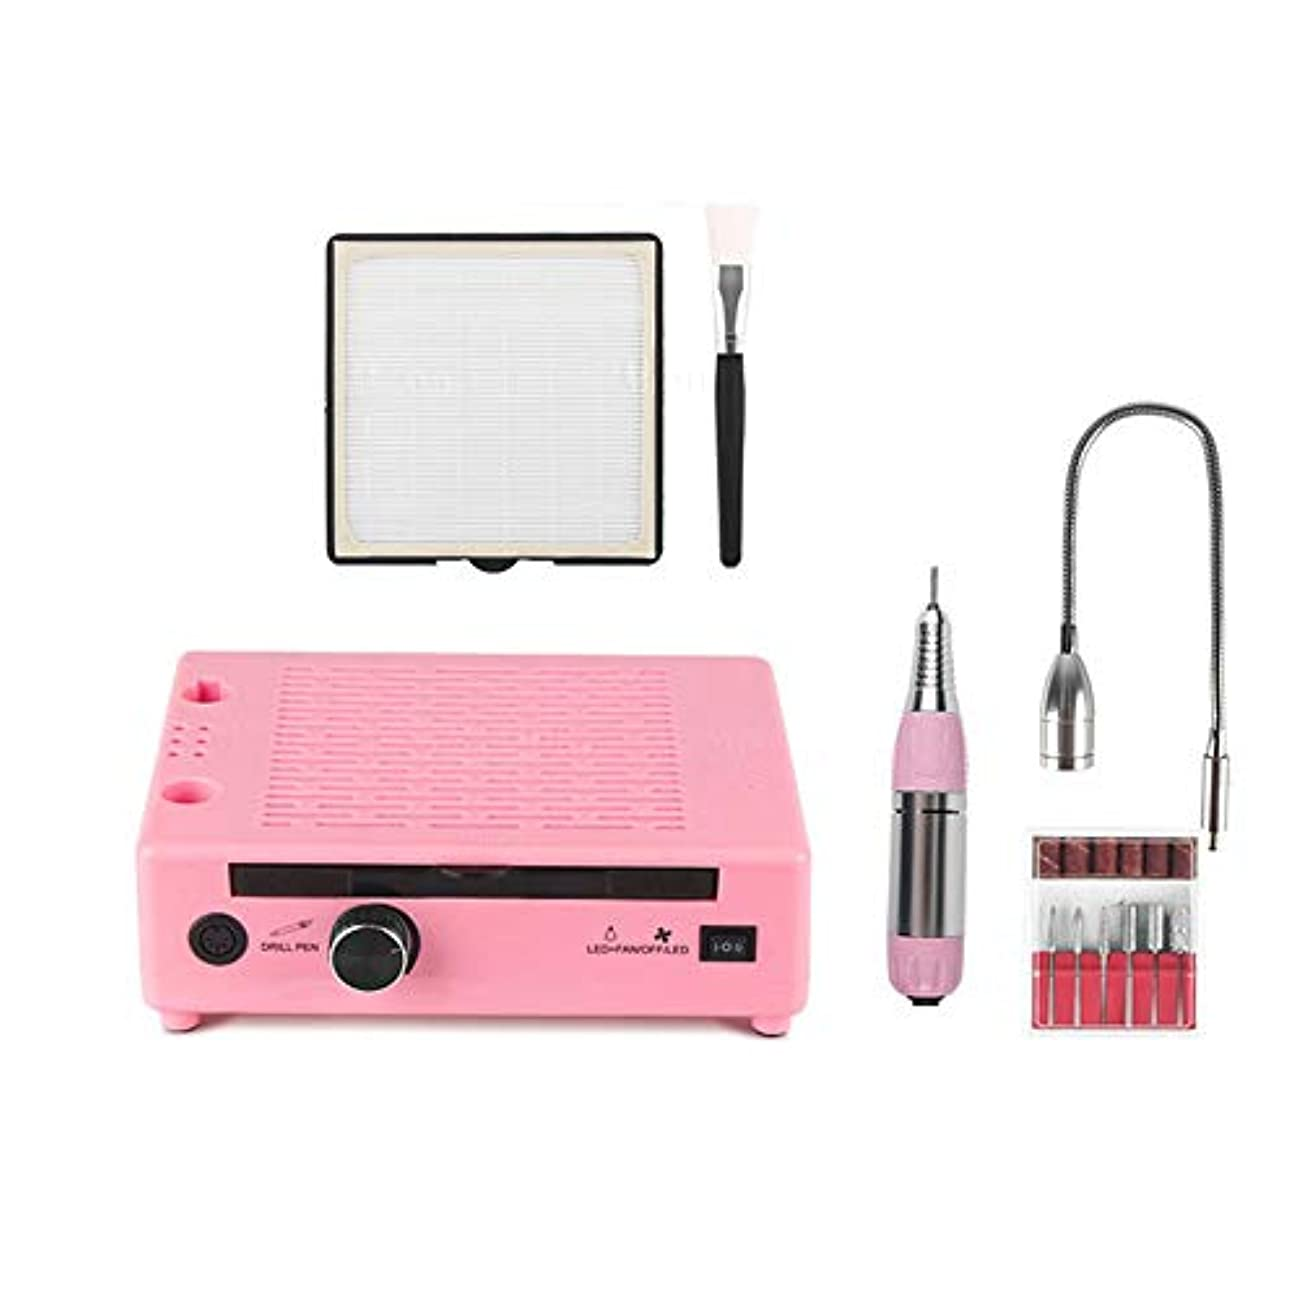 3 IN 1電気ネイルドリルマニキュアペディキュアマシンネイルバキュームクレンザー集塵機LEDランプ電気ネイルファイル